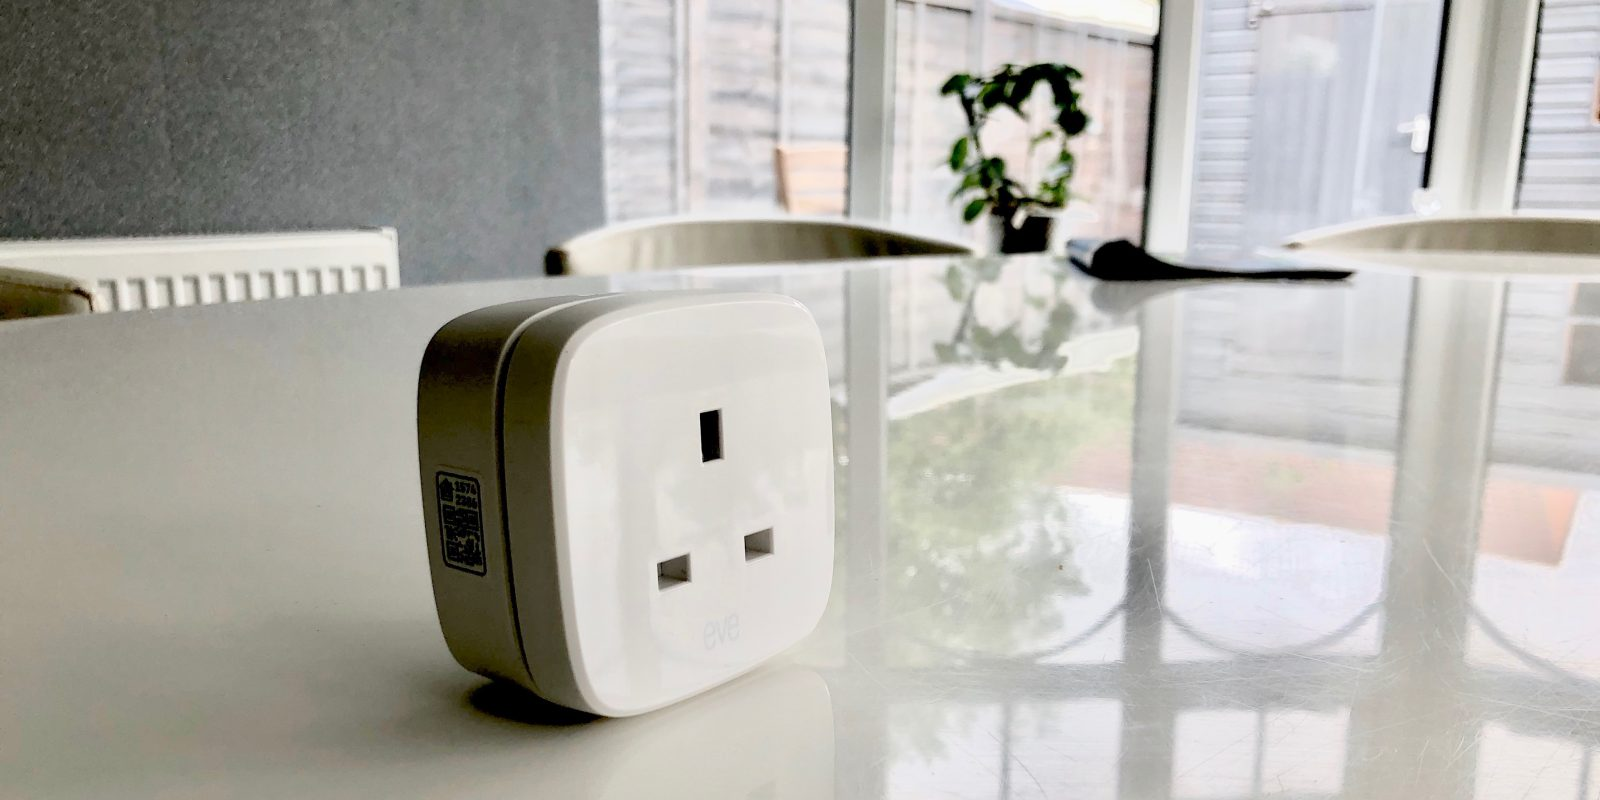 Best UK HomeKit smart plug: Eve Energy review